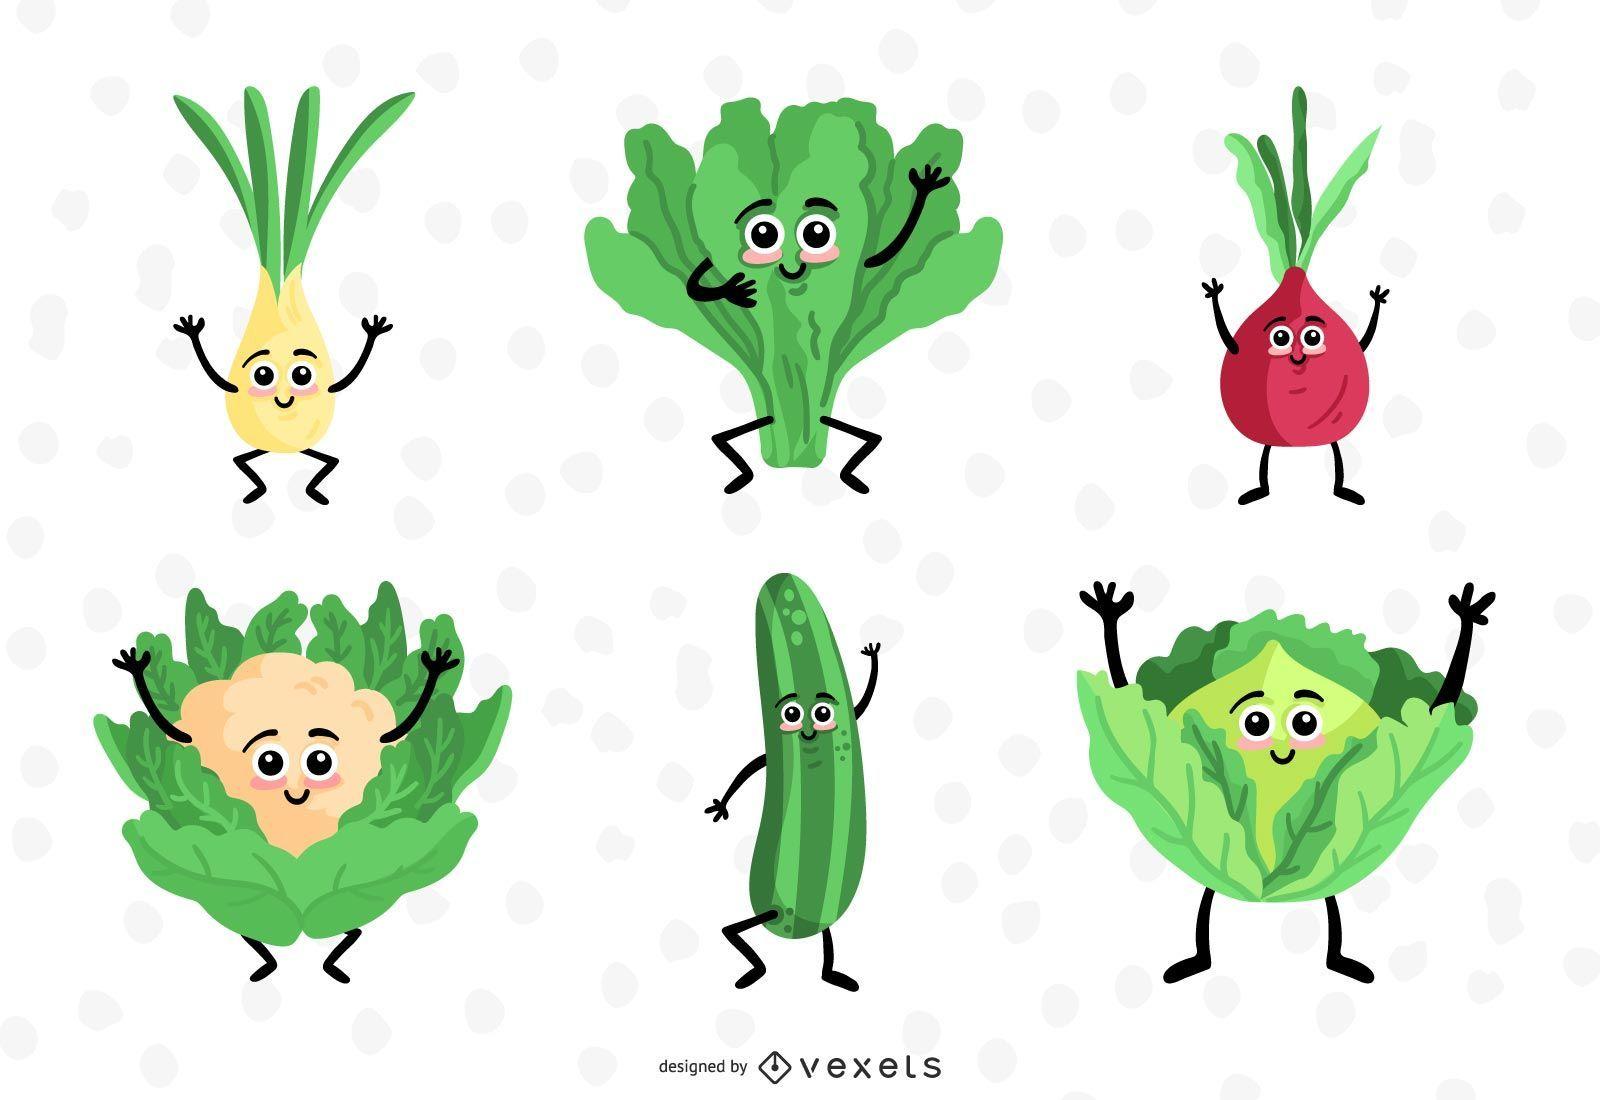 Gemüsedesign-Sammlungsset